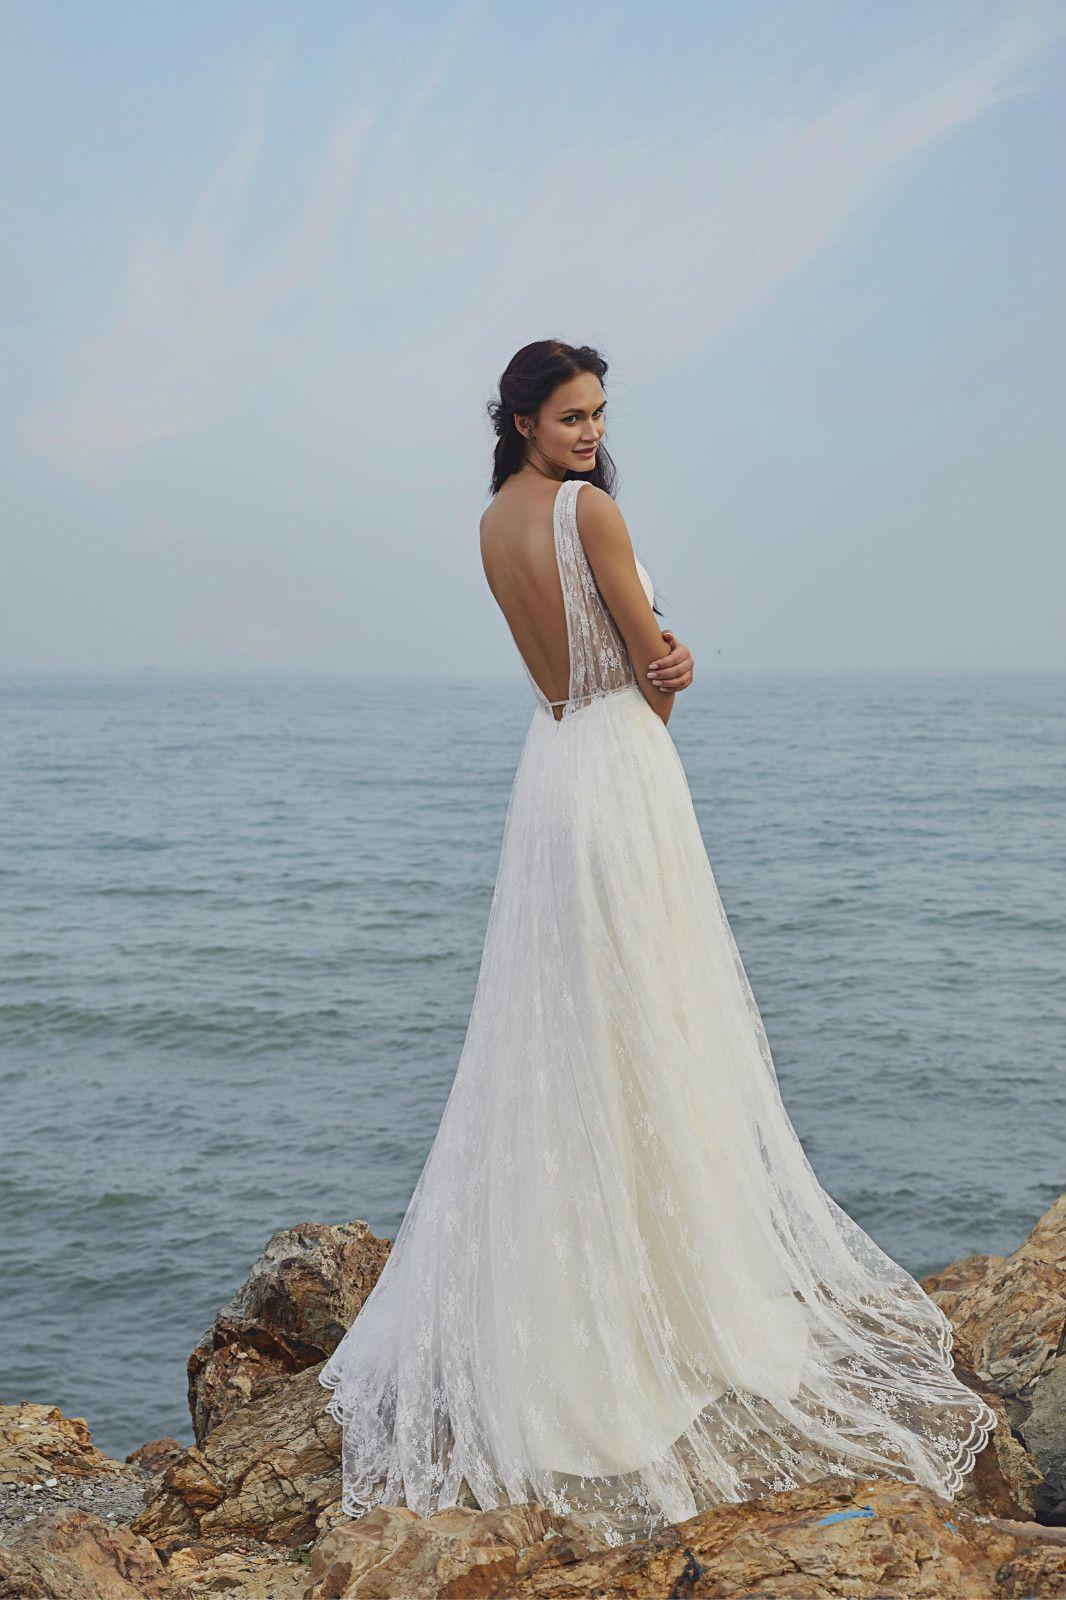 Luxury Saks Bridesmaid Dresses Festooning - Womens Dresses & Gowns ...